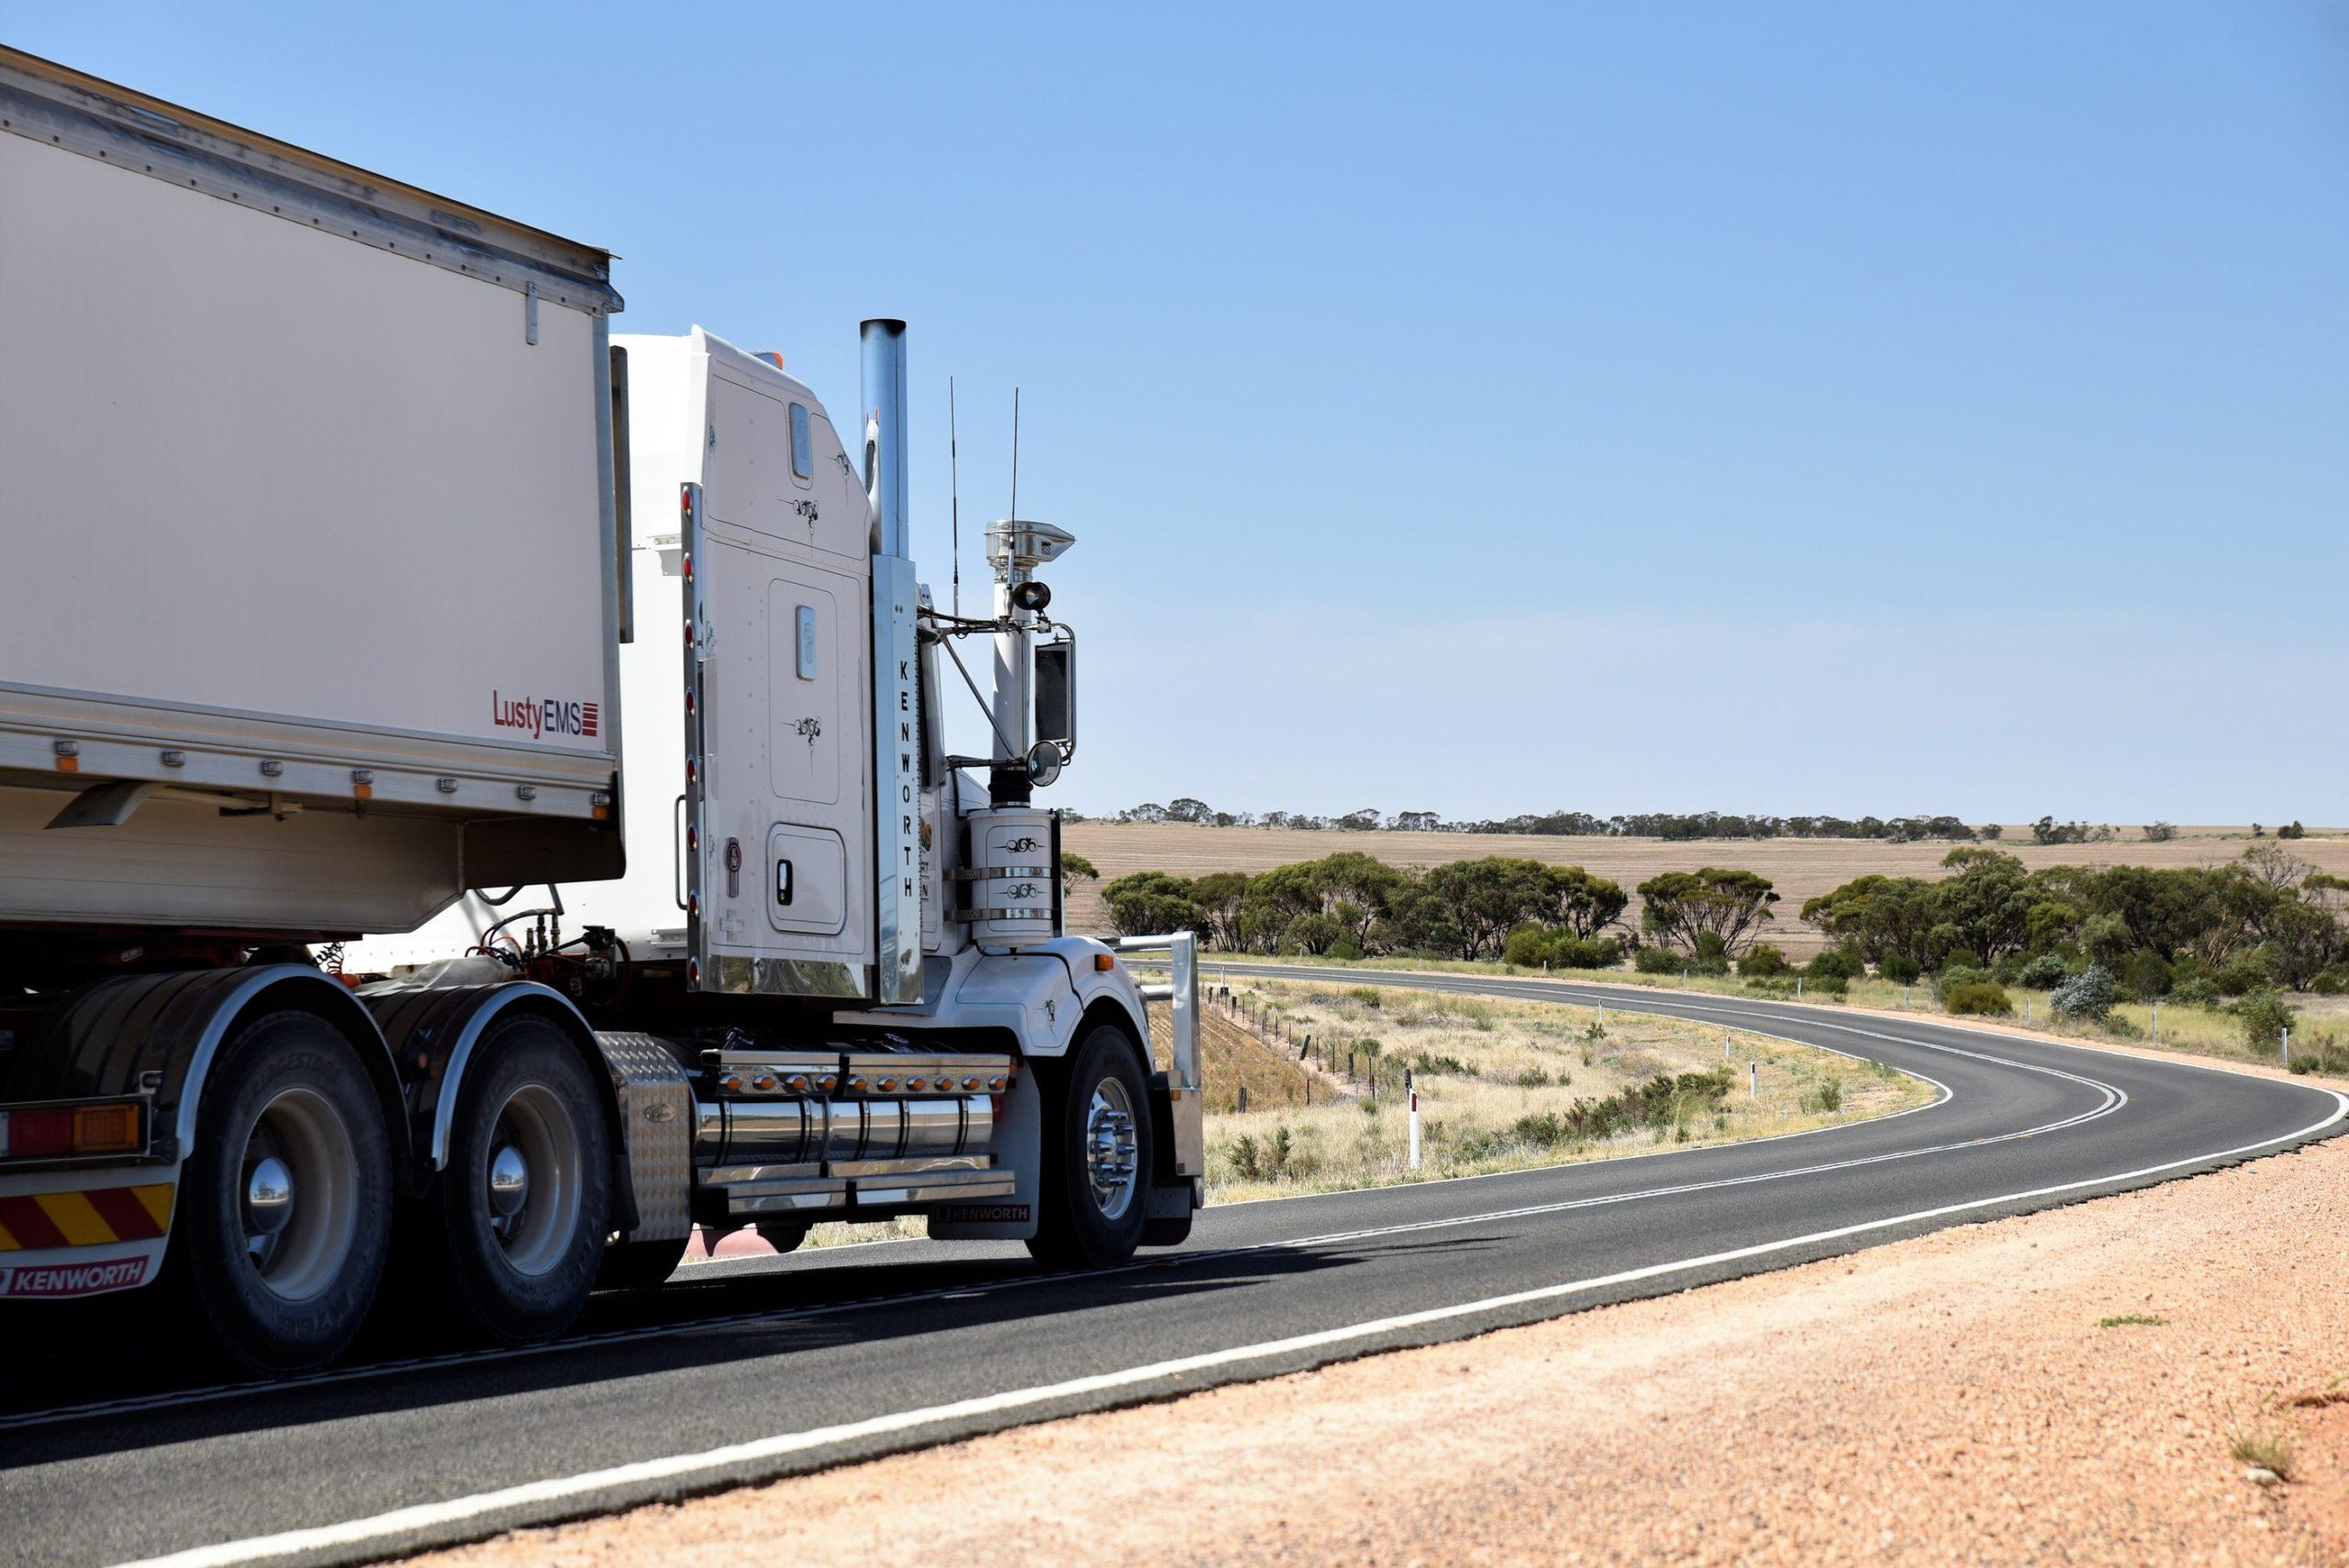 Hindmarsh truck